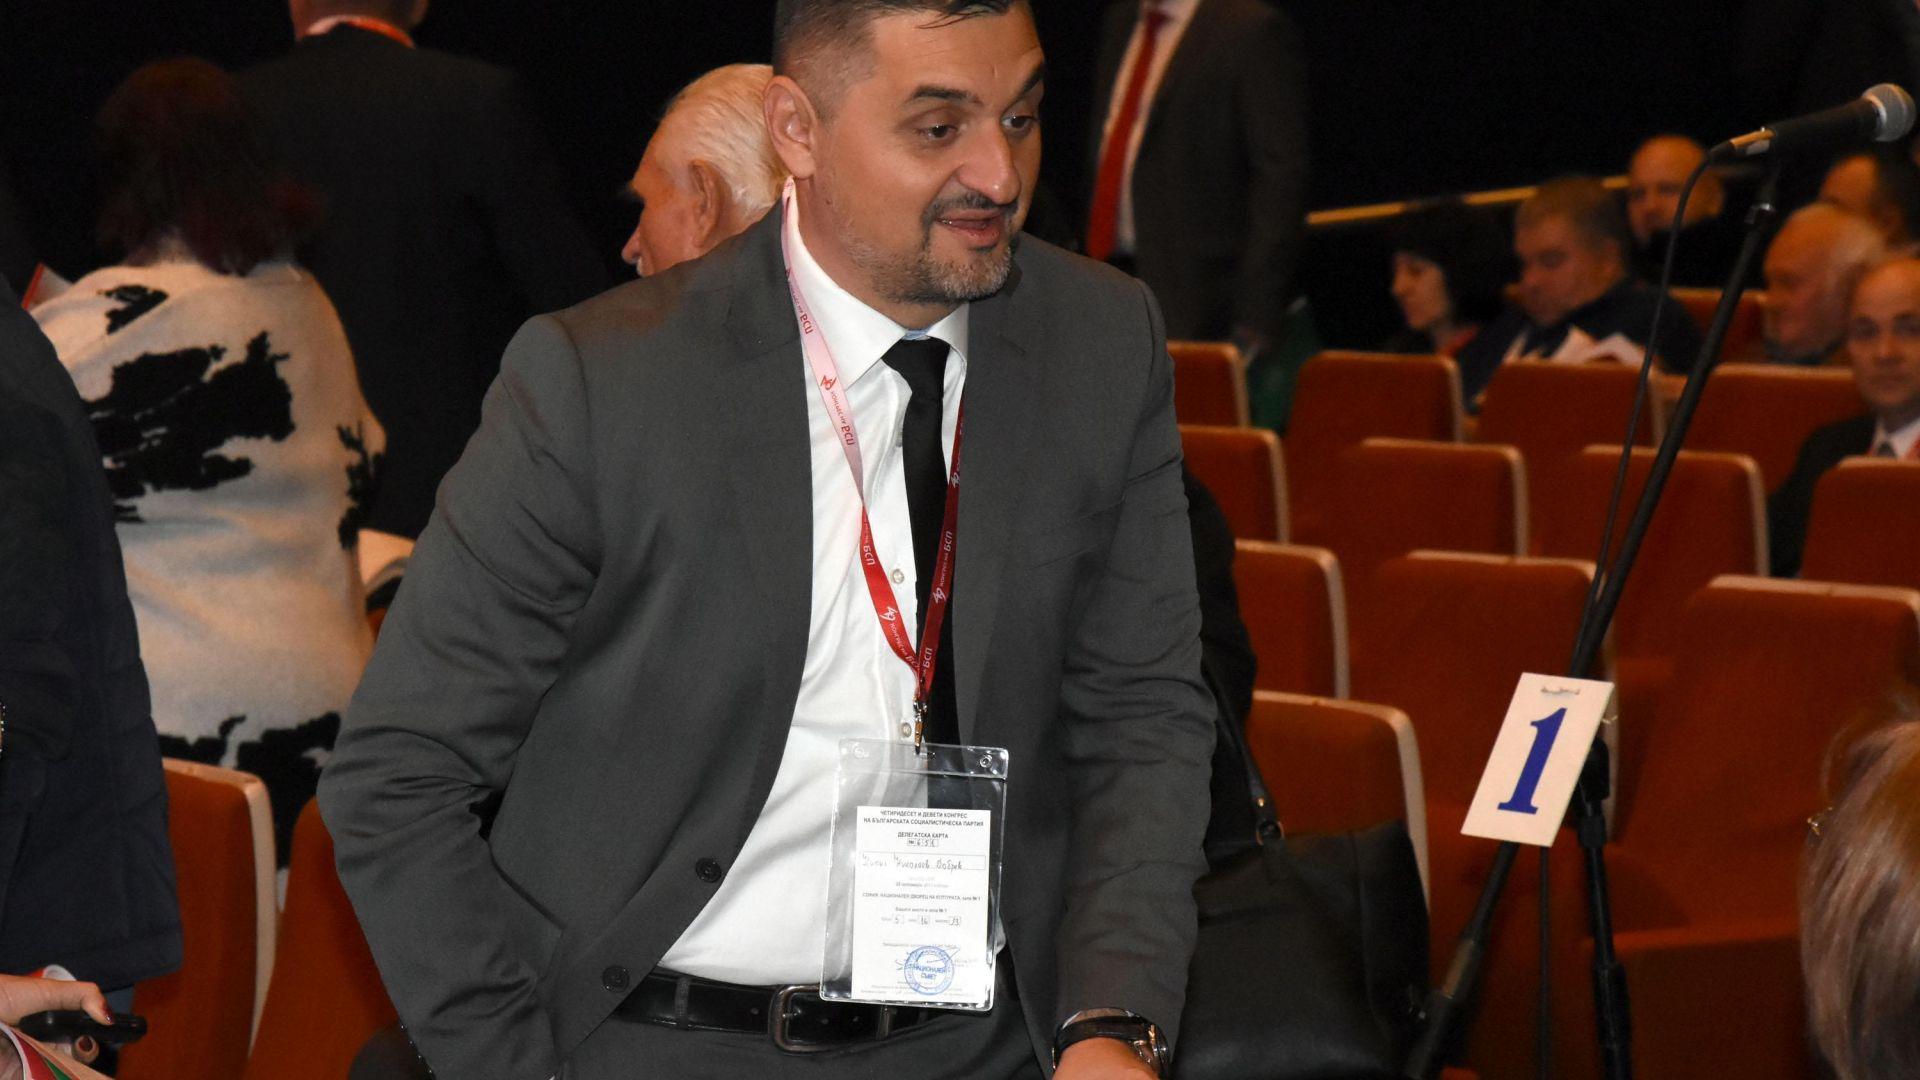 Кирил Добрев: БСП с радост ще гласува за трети мандат на Сергей Станишев, постижението е уникално